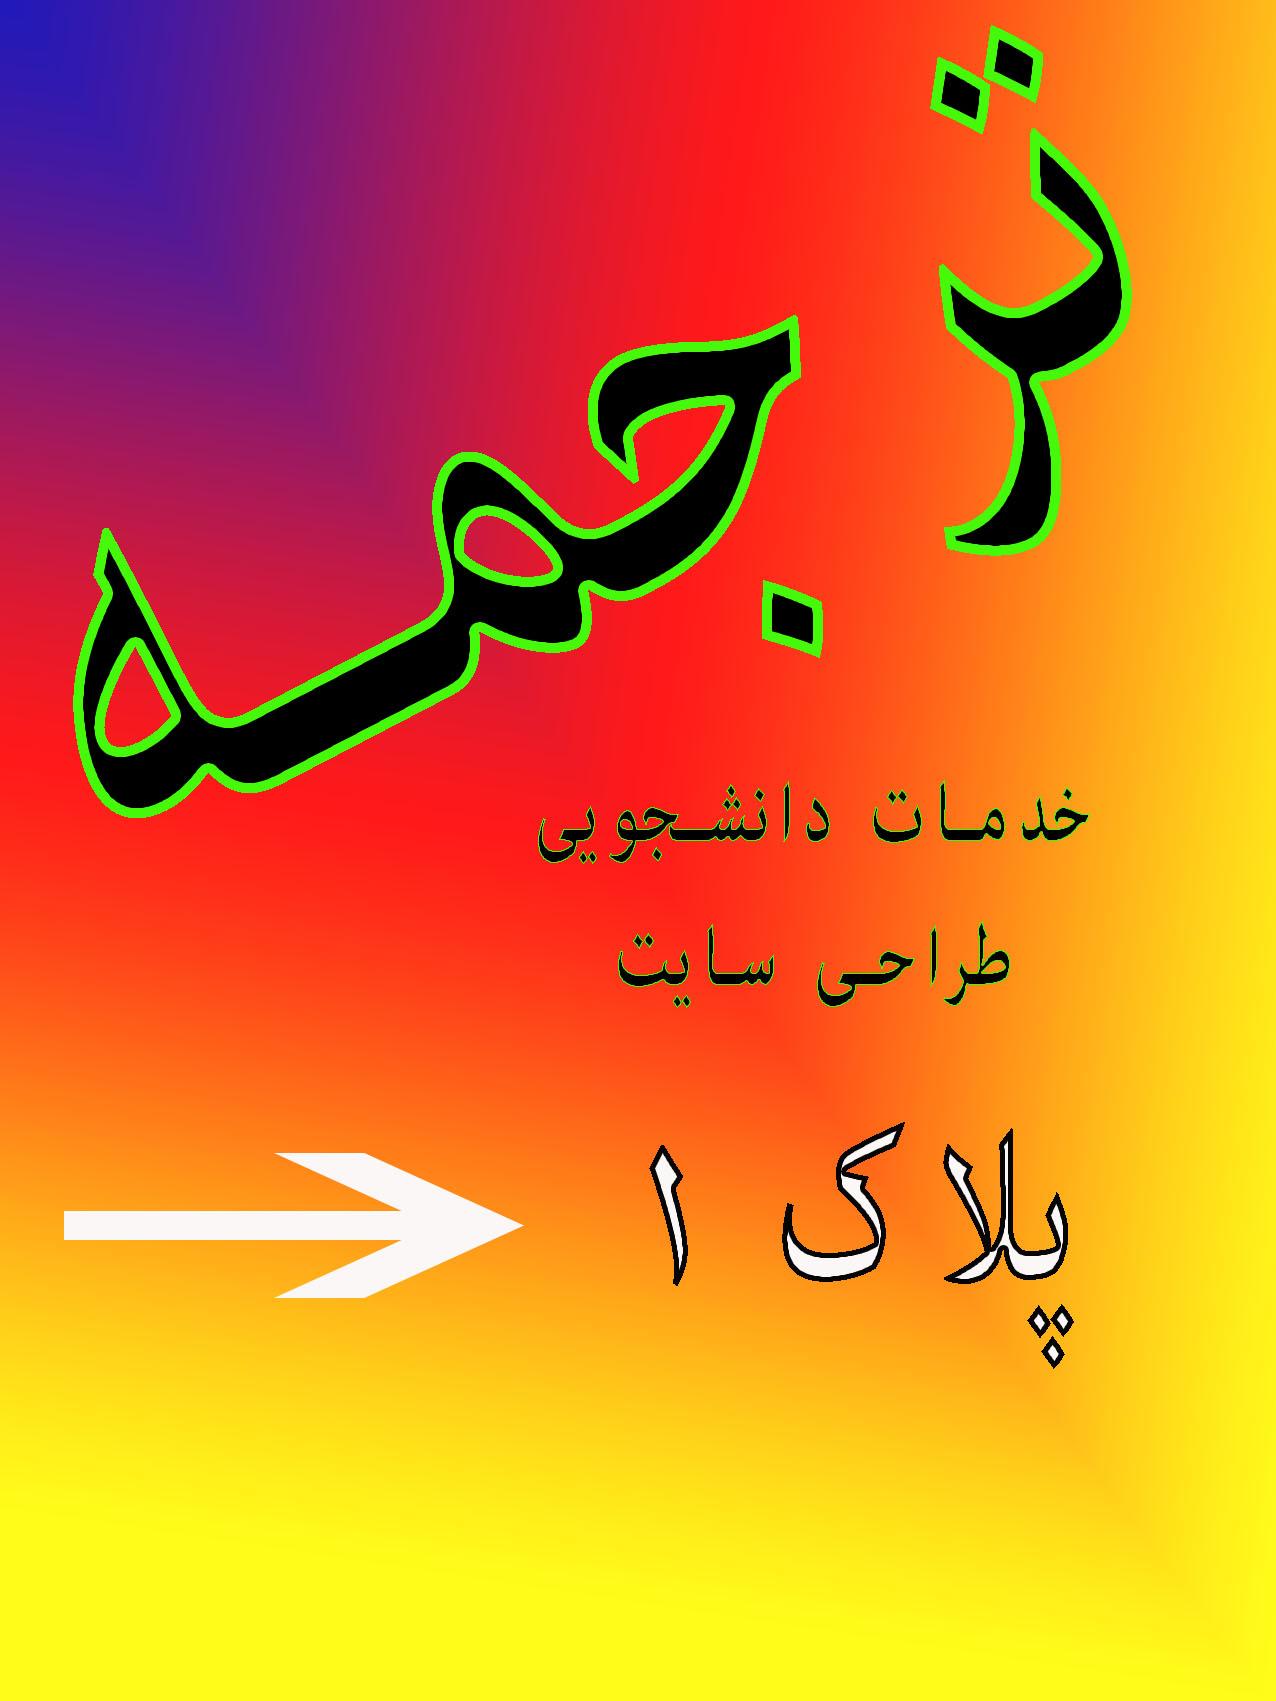 ترجمه مطلوب